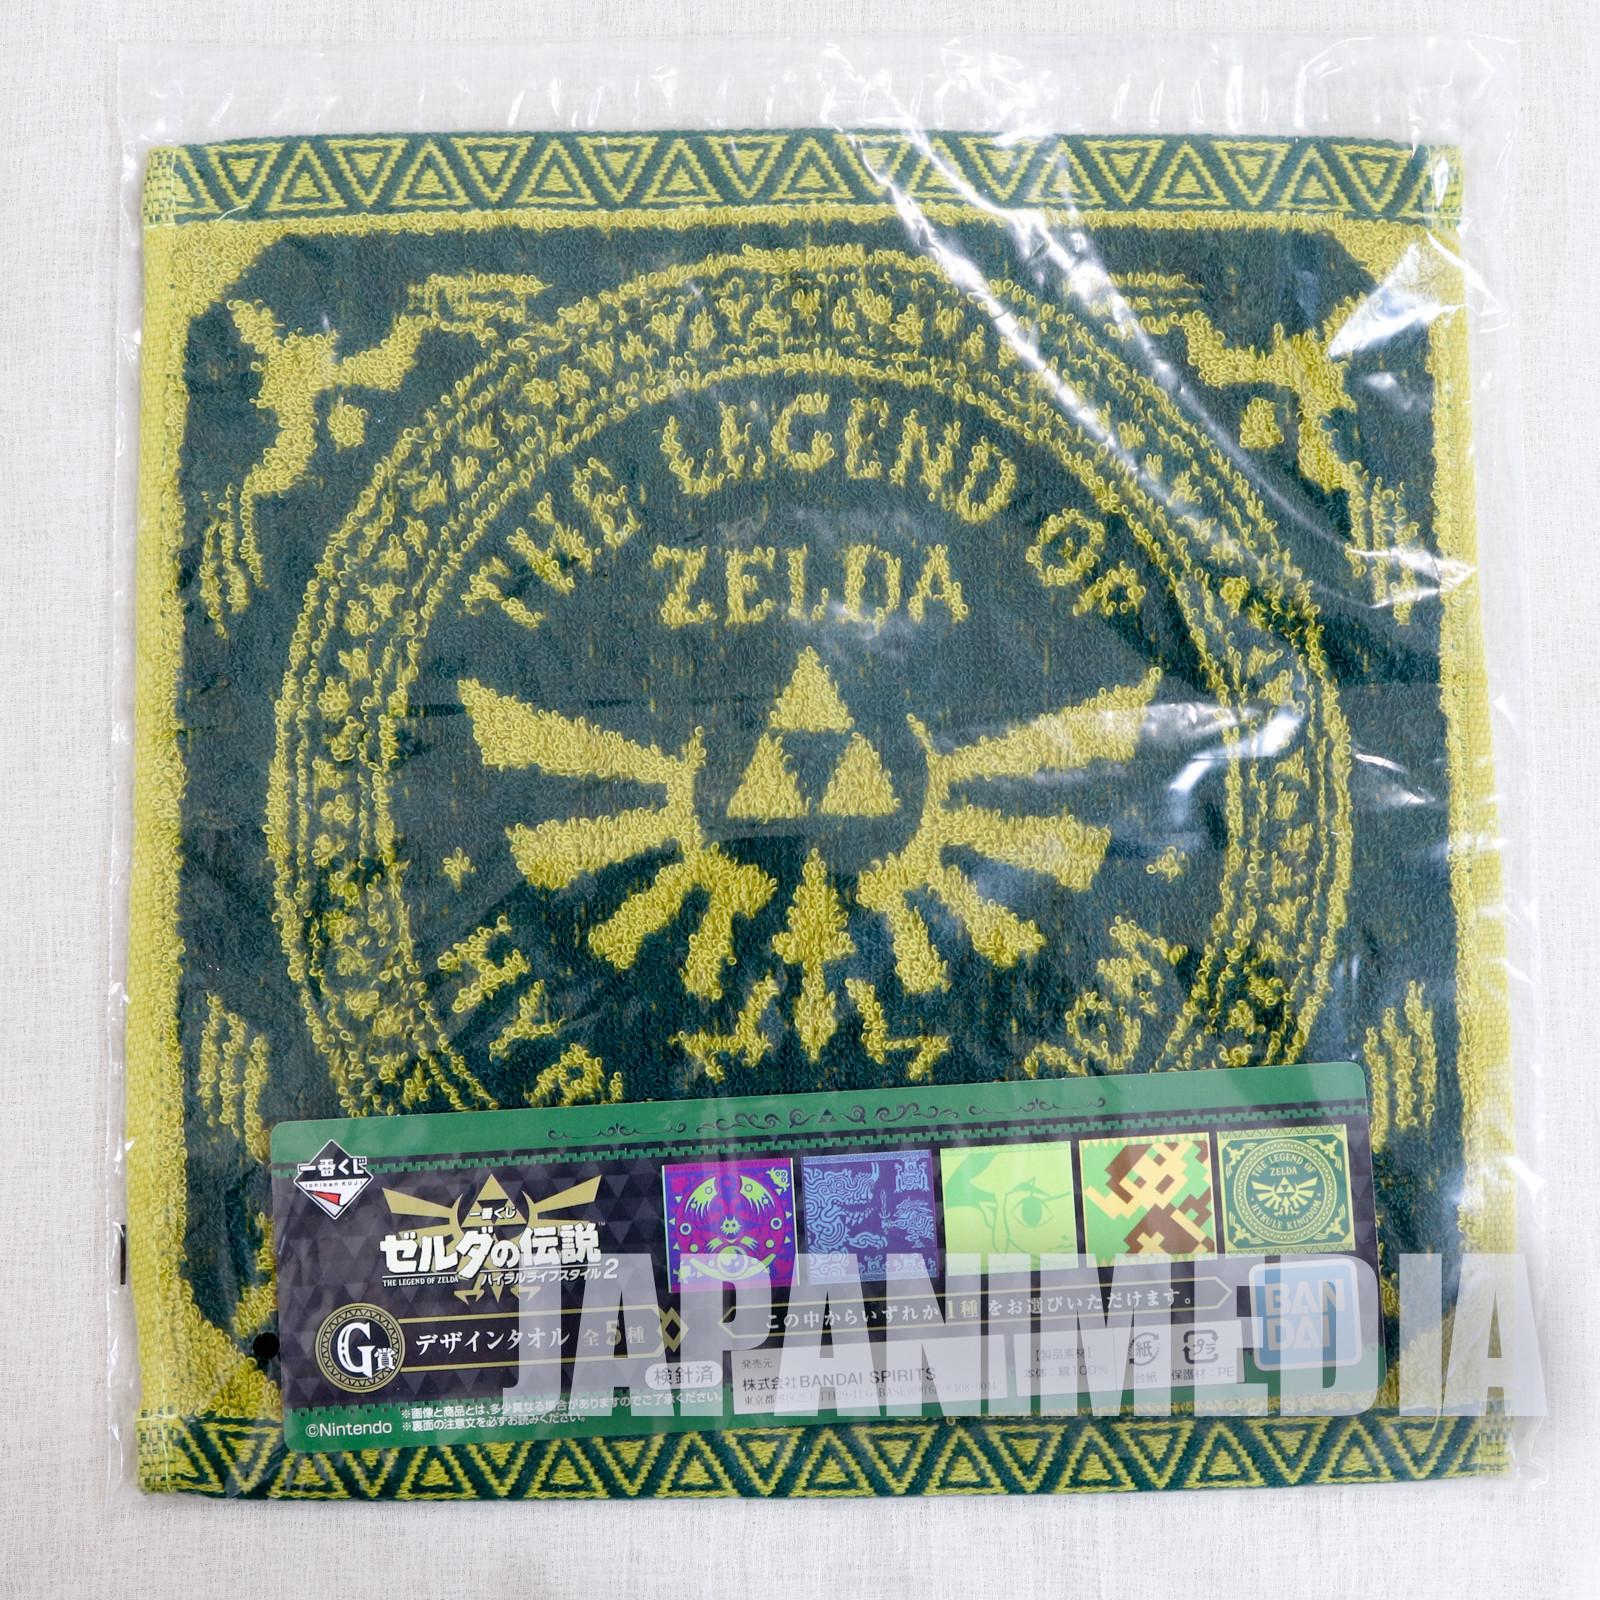 The Legend of Zelda Hyrule Life Design Towel 10x10 inch #5 Nintendo BANDAI